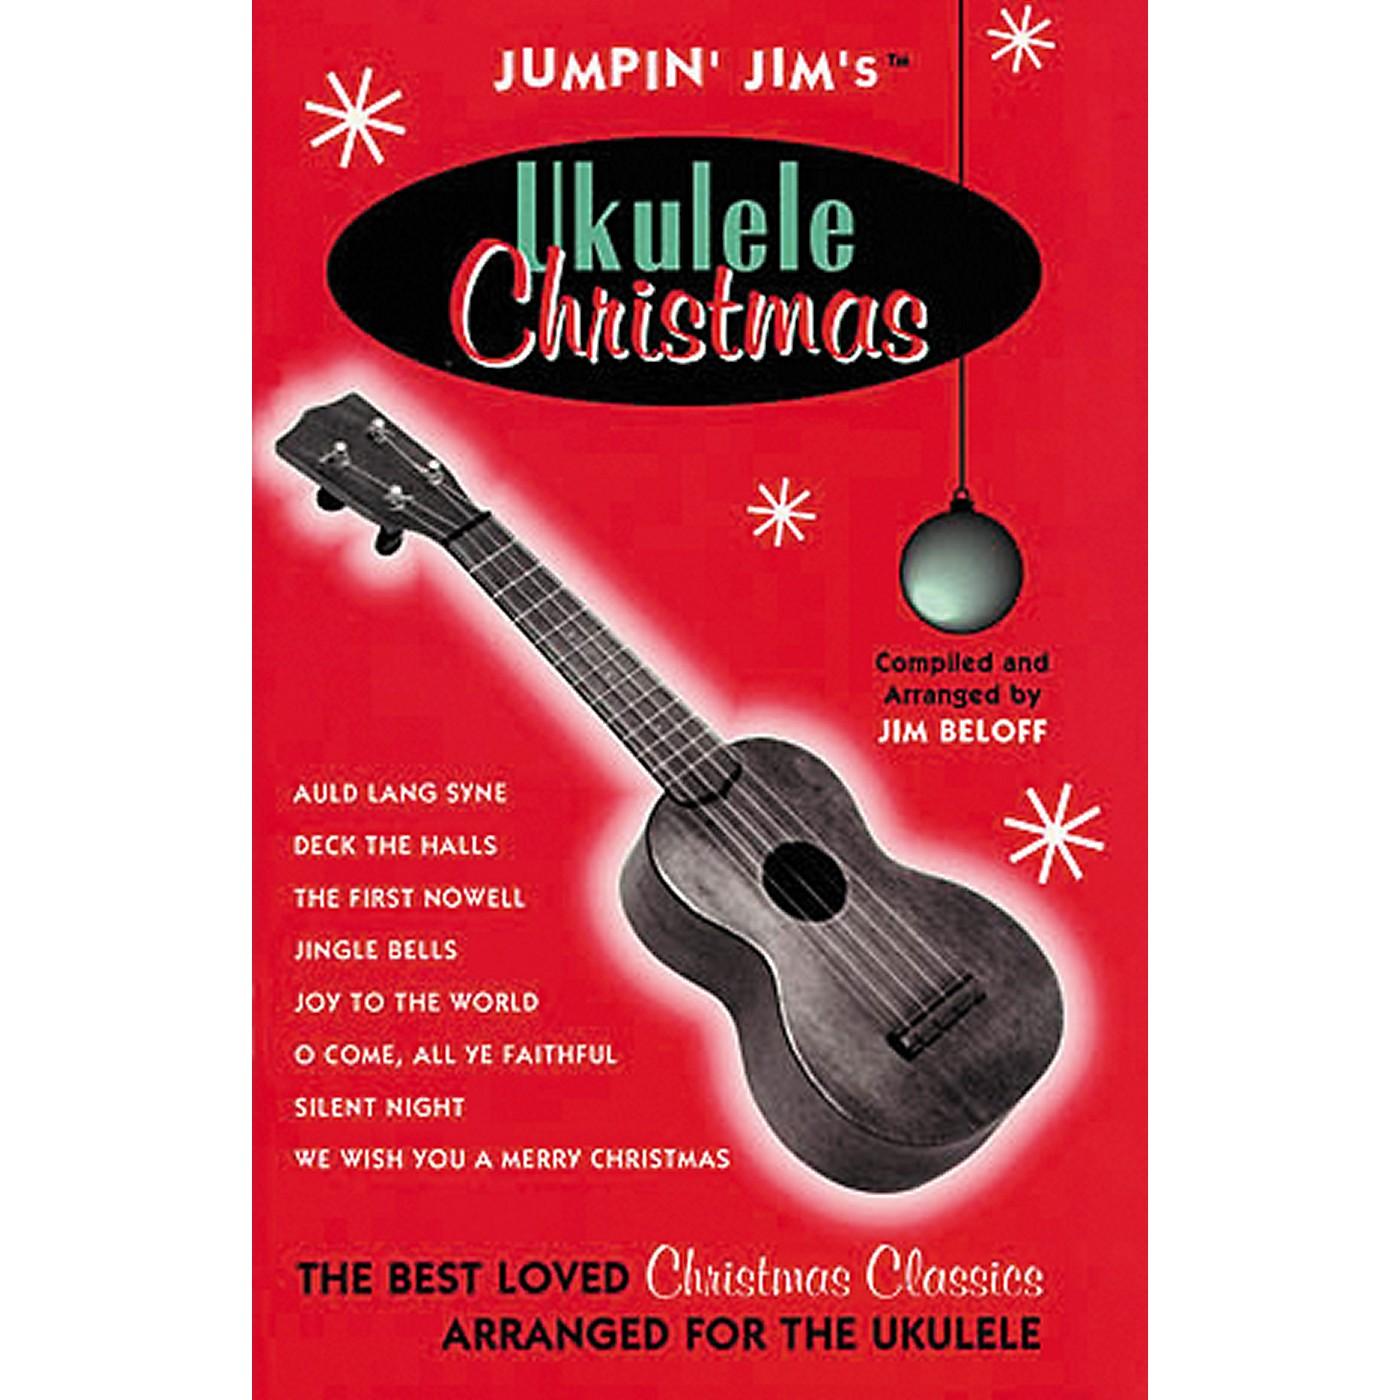 Hal Leonard Jumpin' Jim's Ukulele Christmas Tab Songbook thumbnail